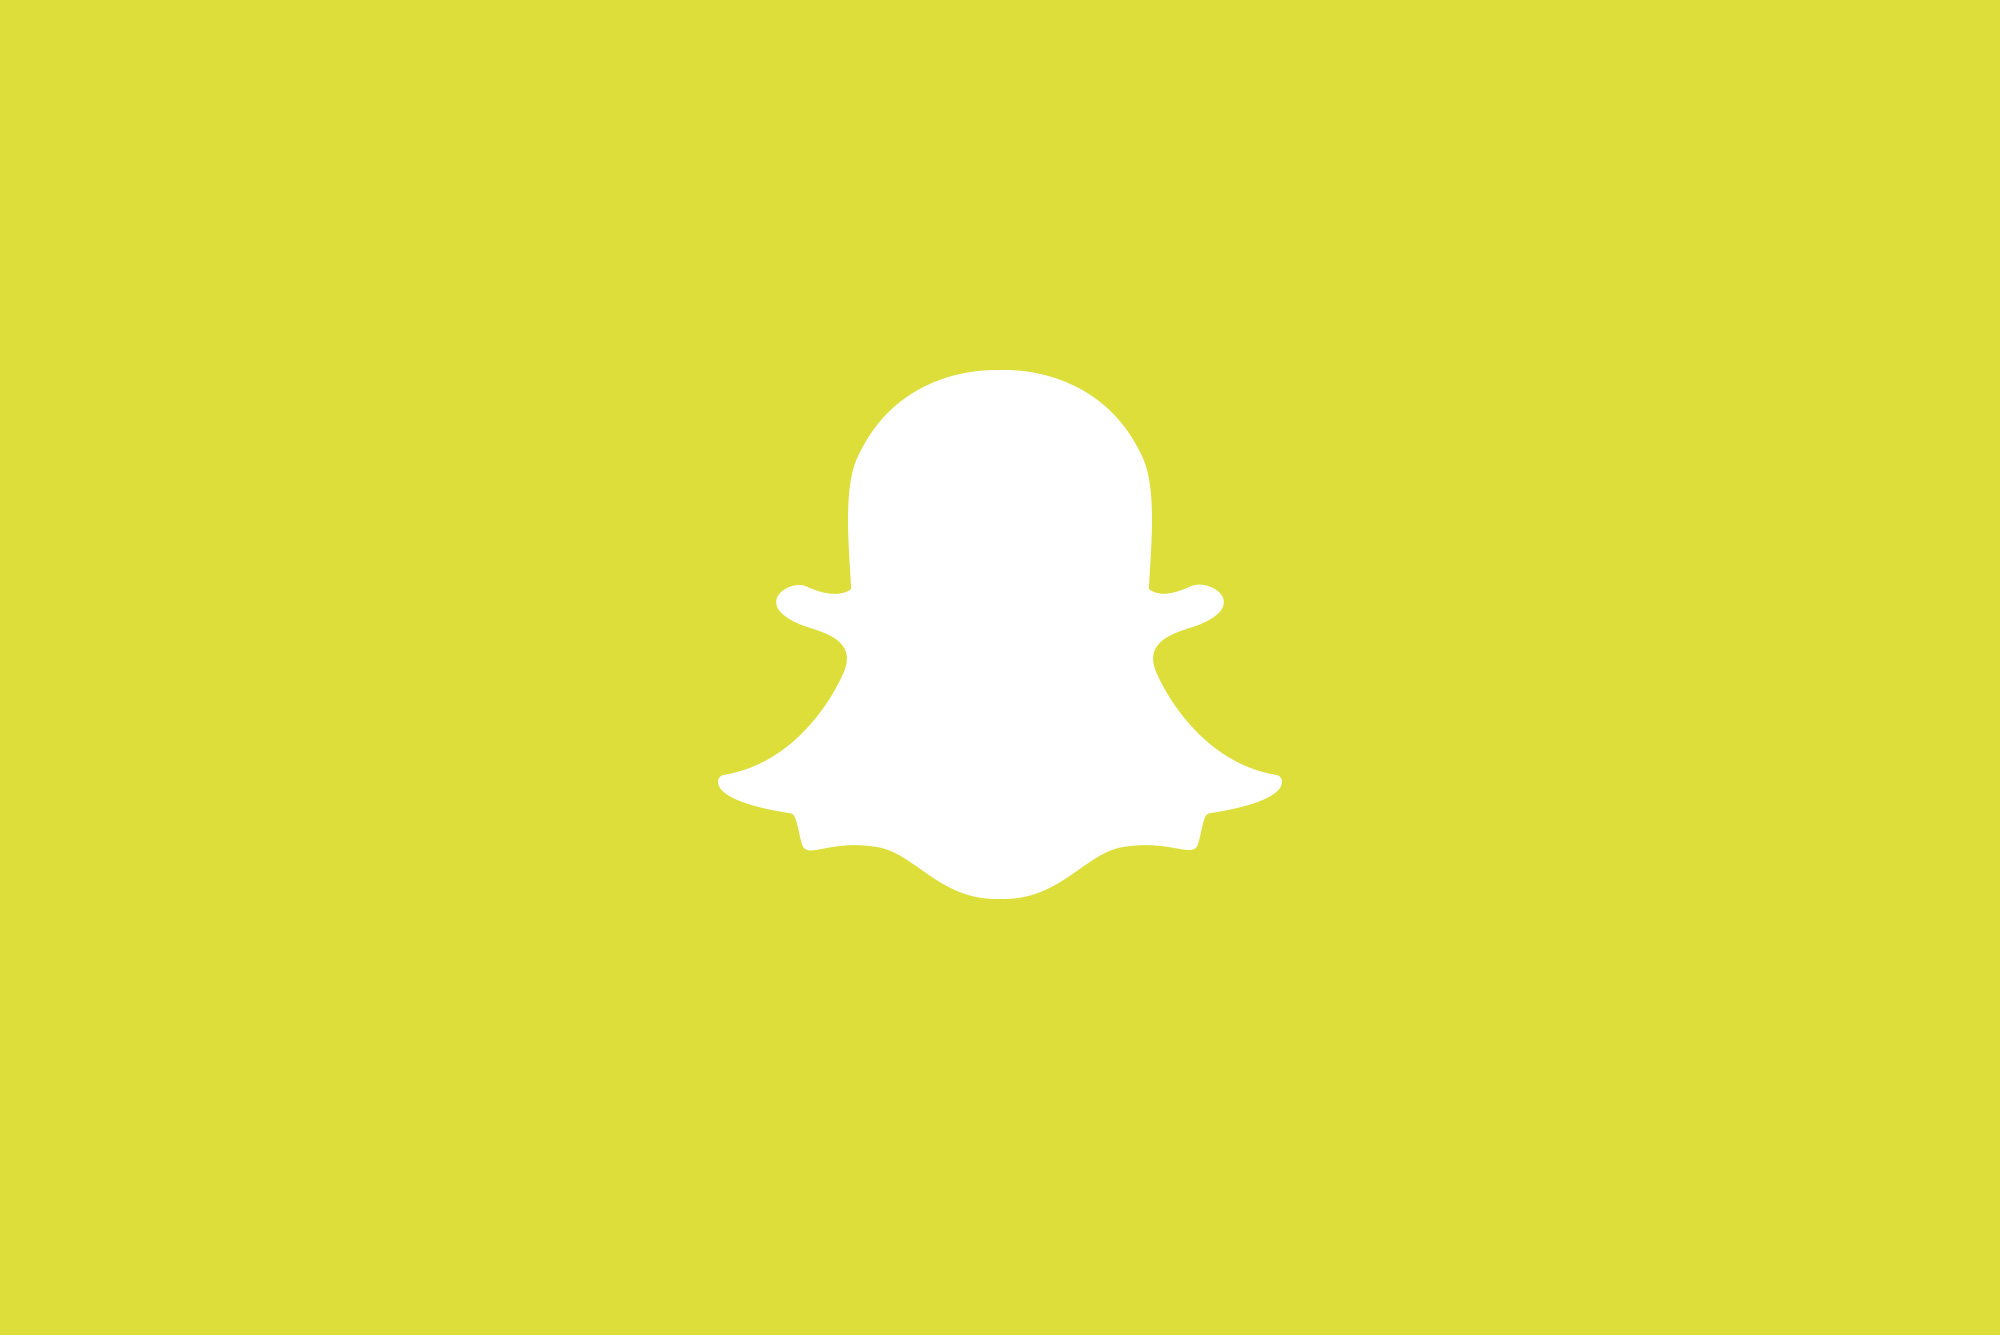 Snapchat icon on yellow background